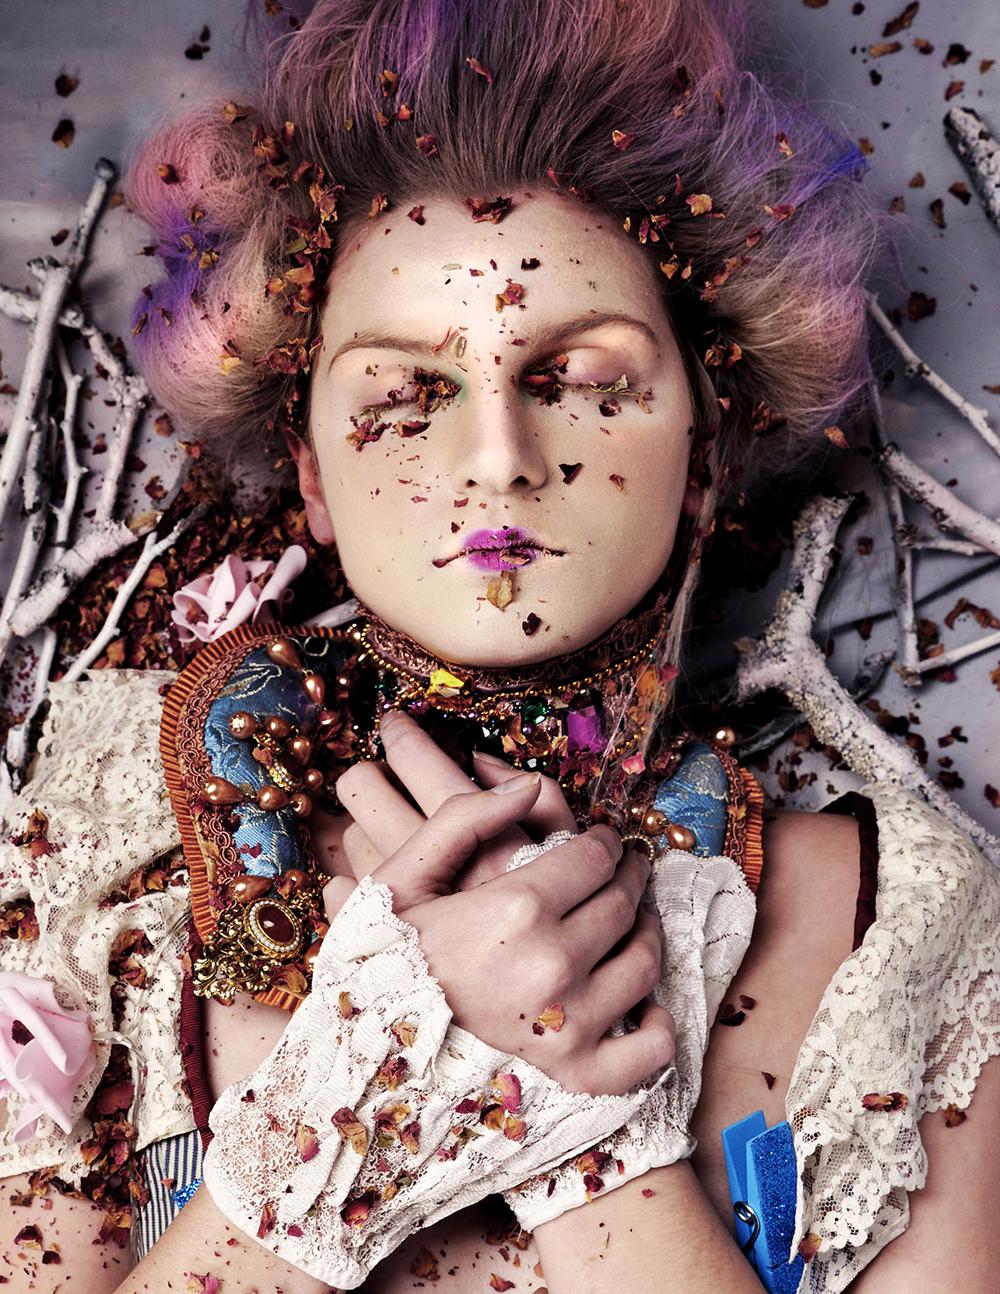 Her Bones are Made of Roses © Jasmine De Silva